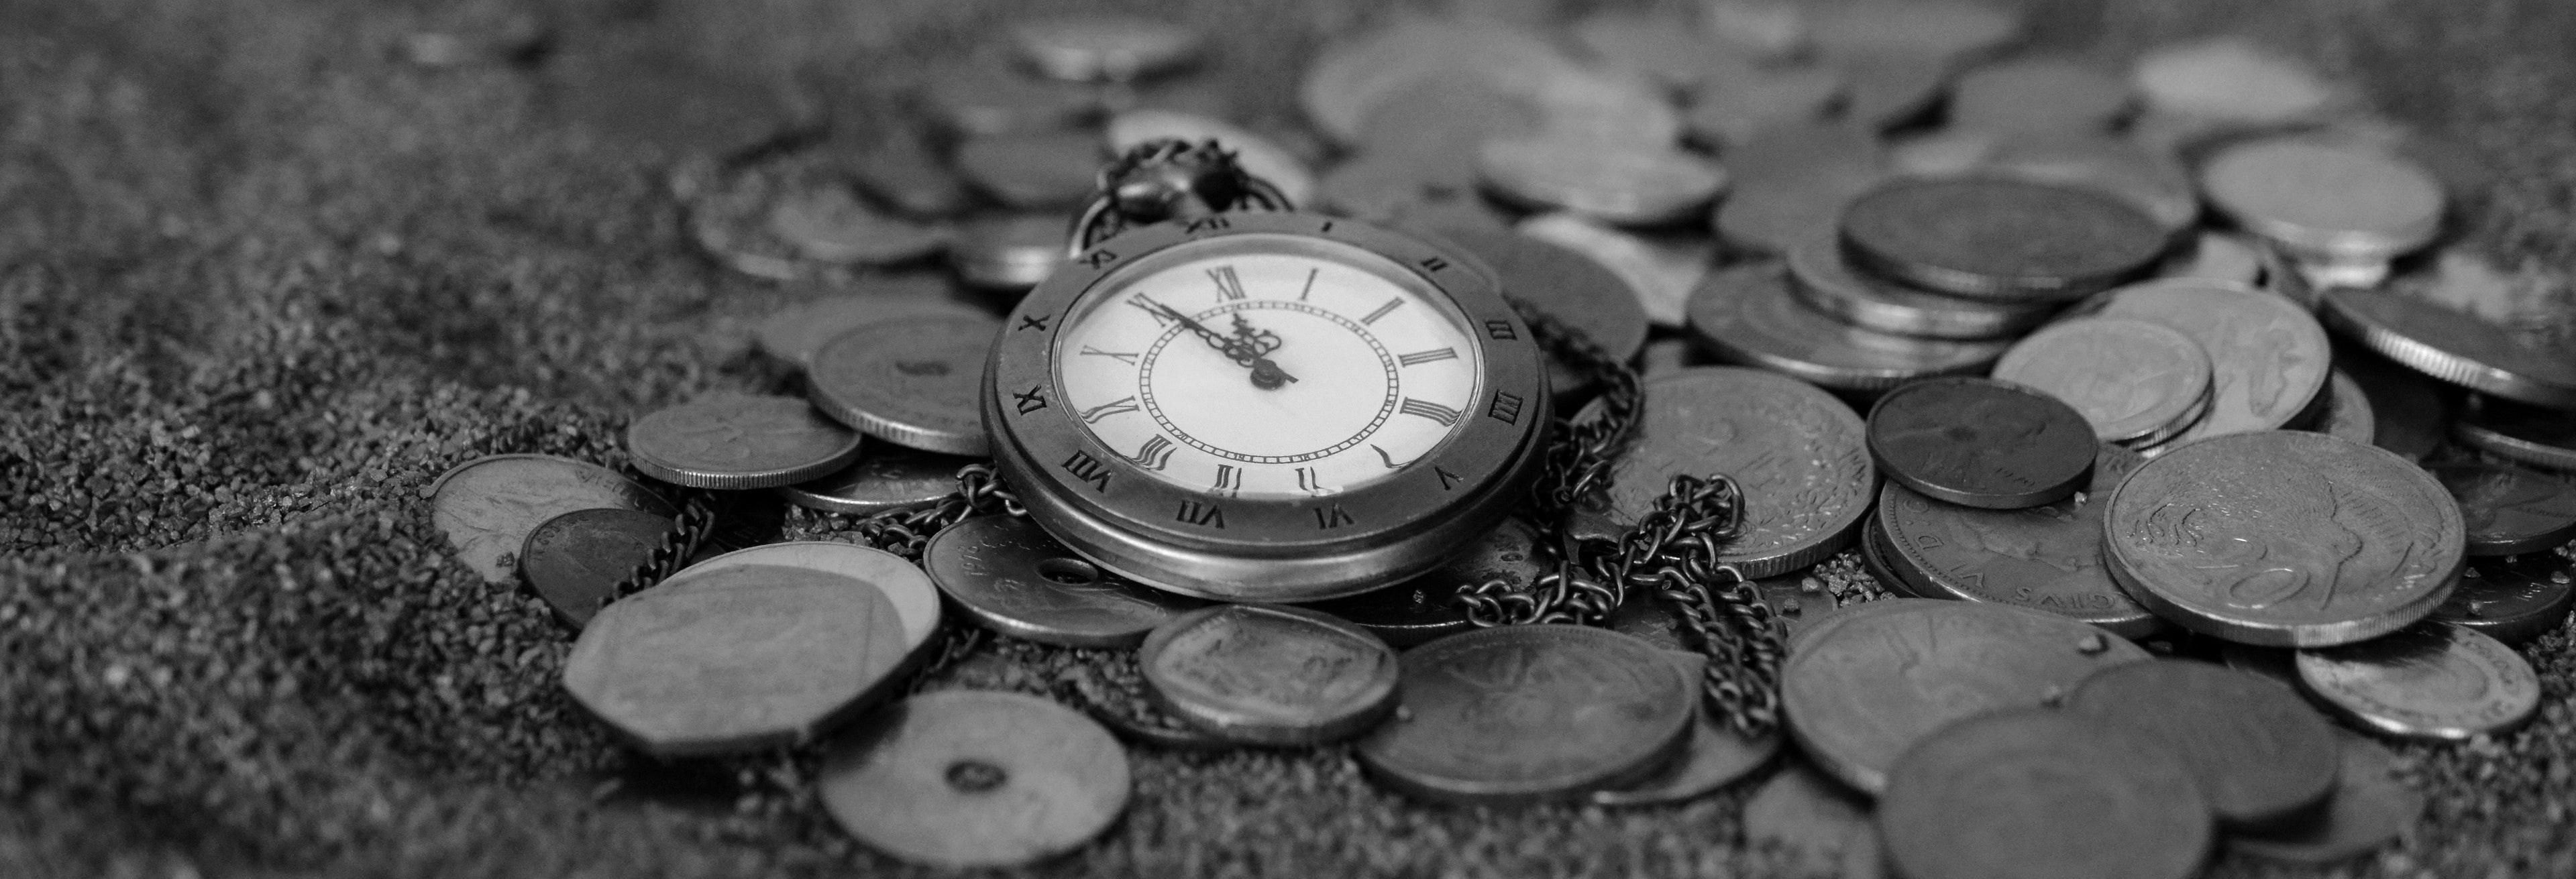 Antique black and white clock